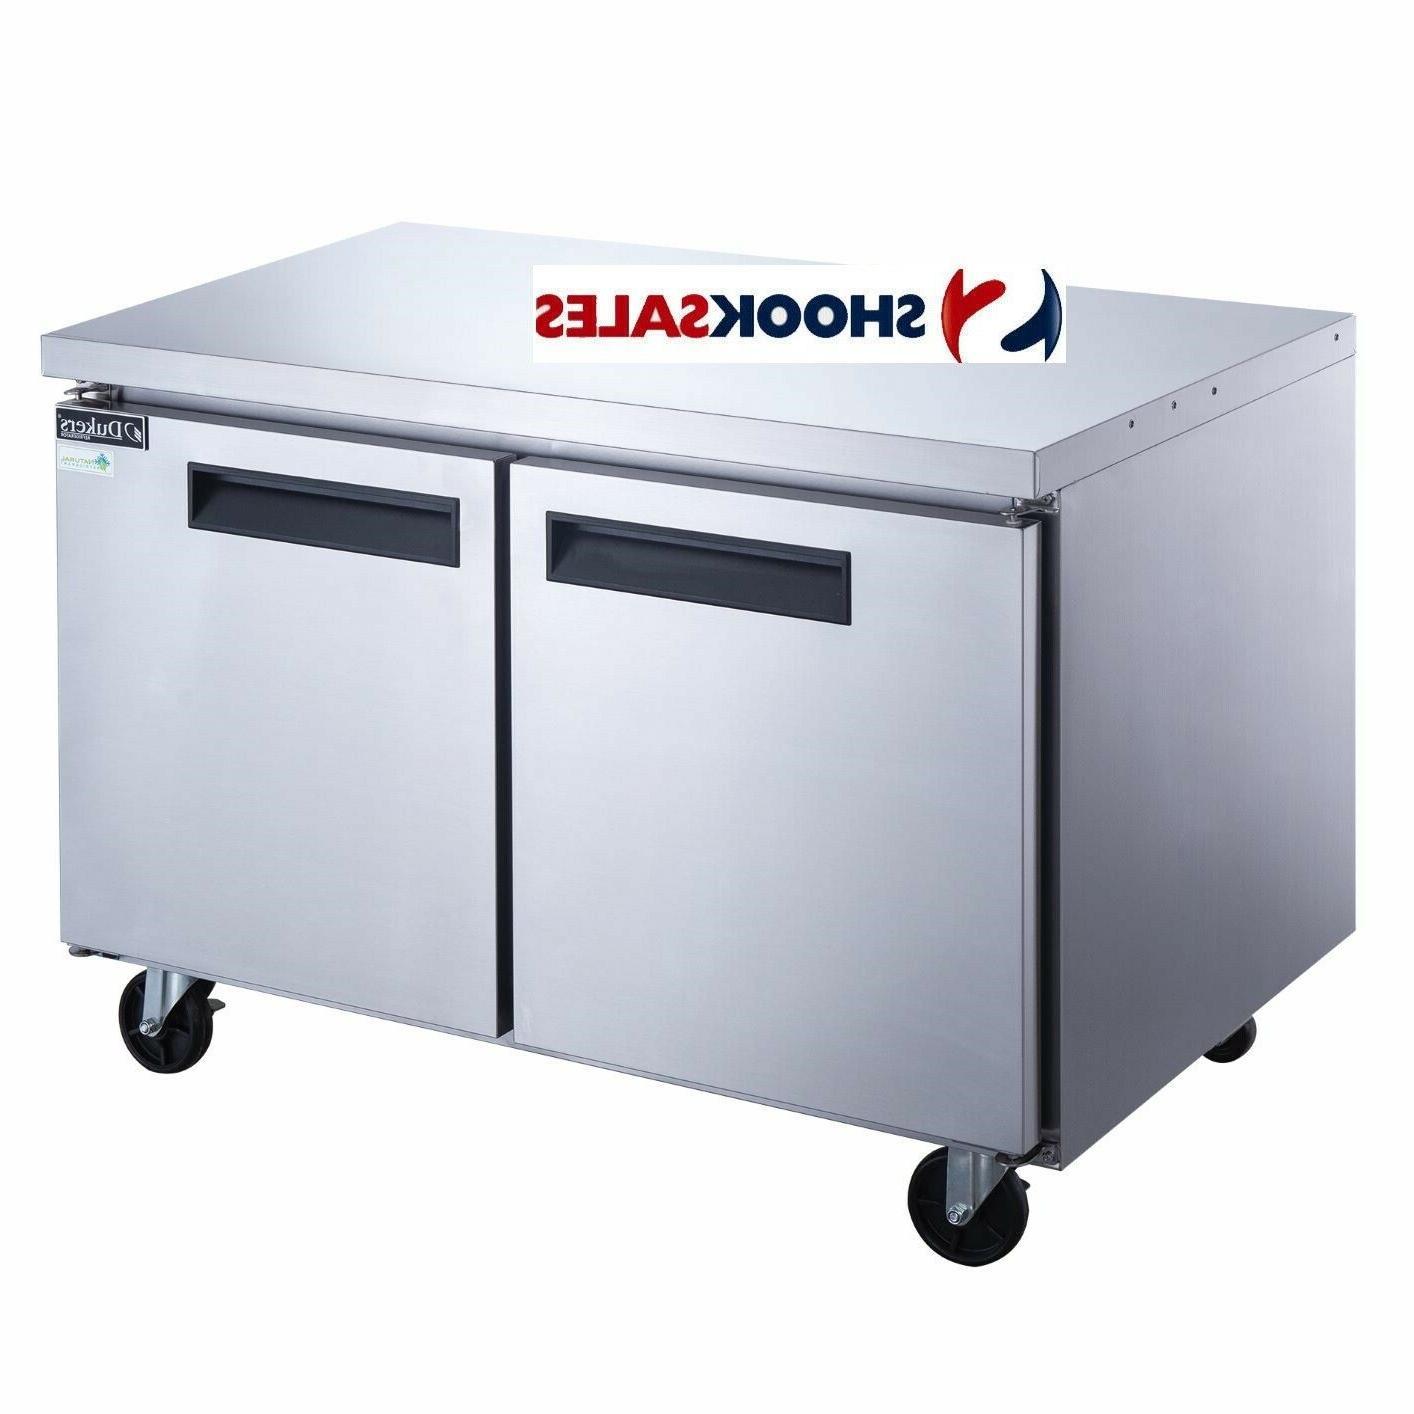 duc60f 60 inch undercounter freezer 15 5